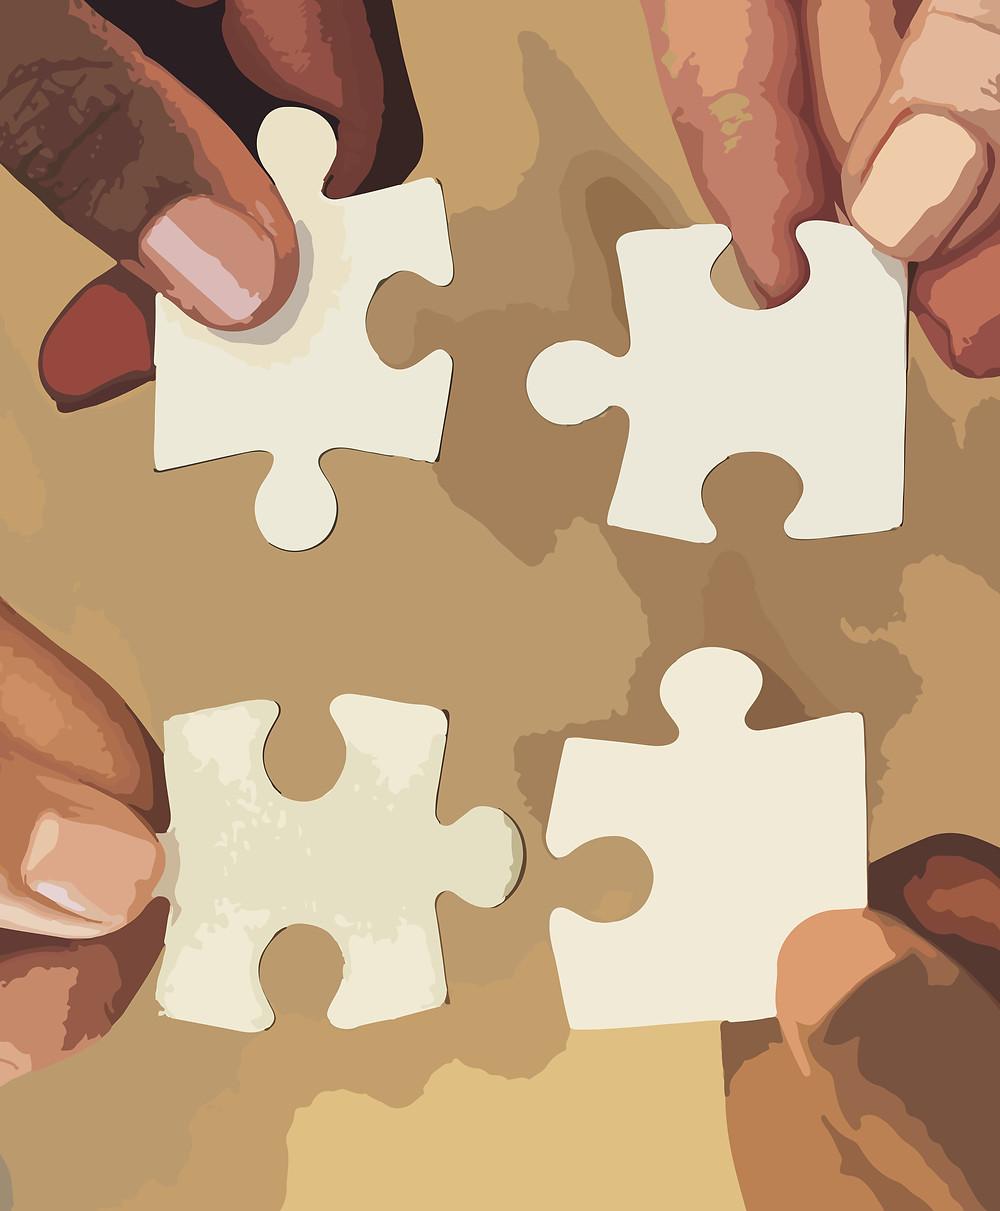 ikenaa - Collaboration